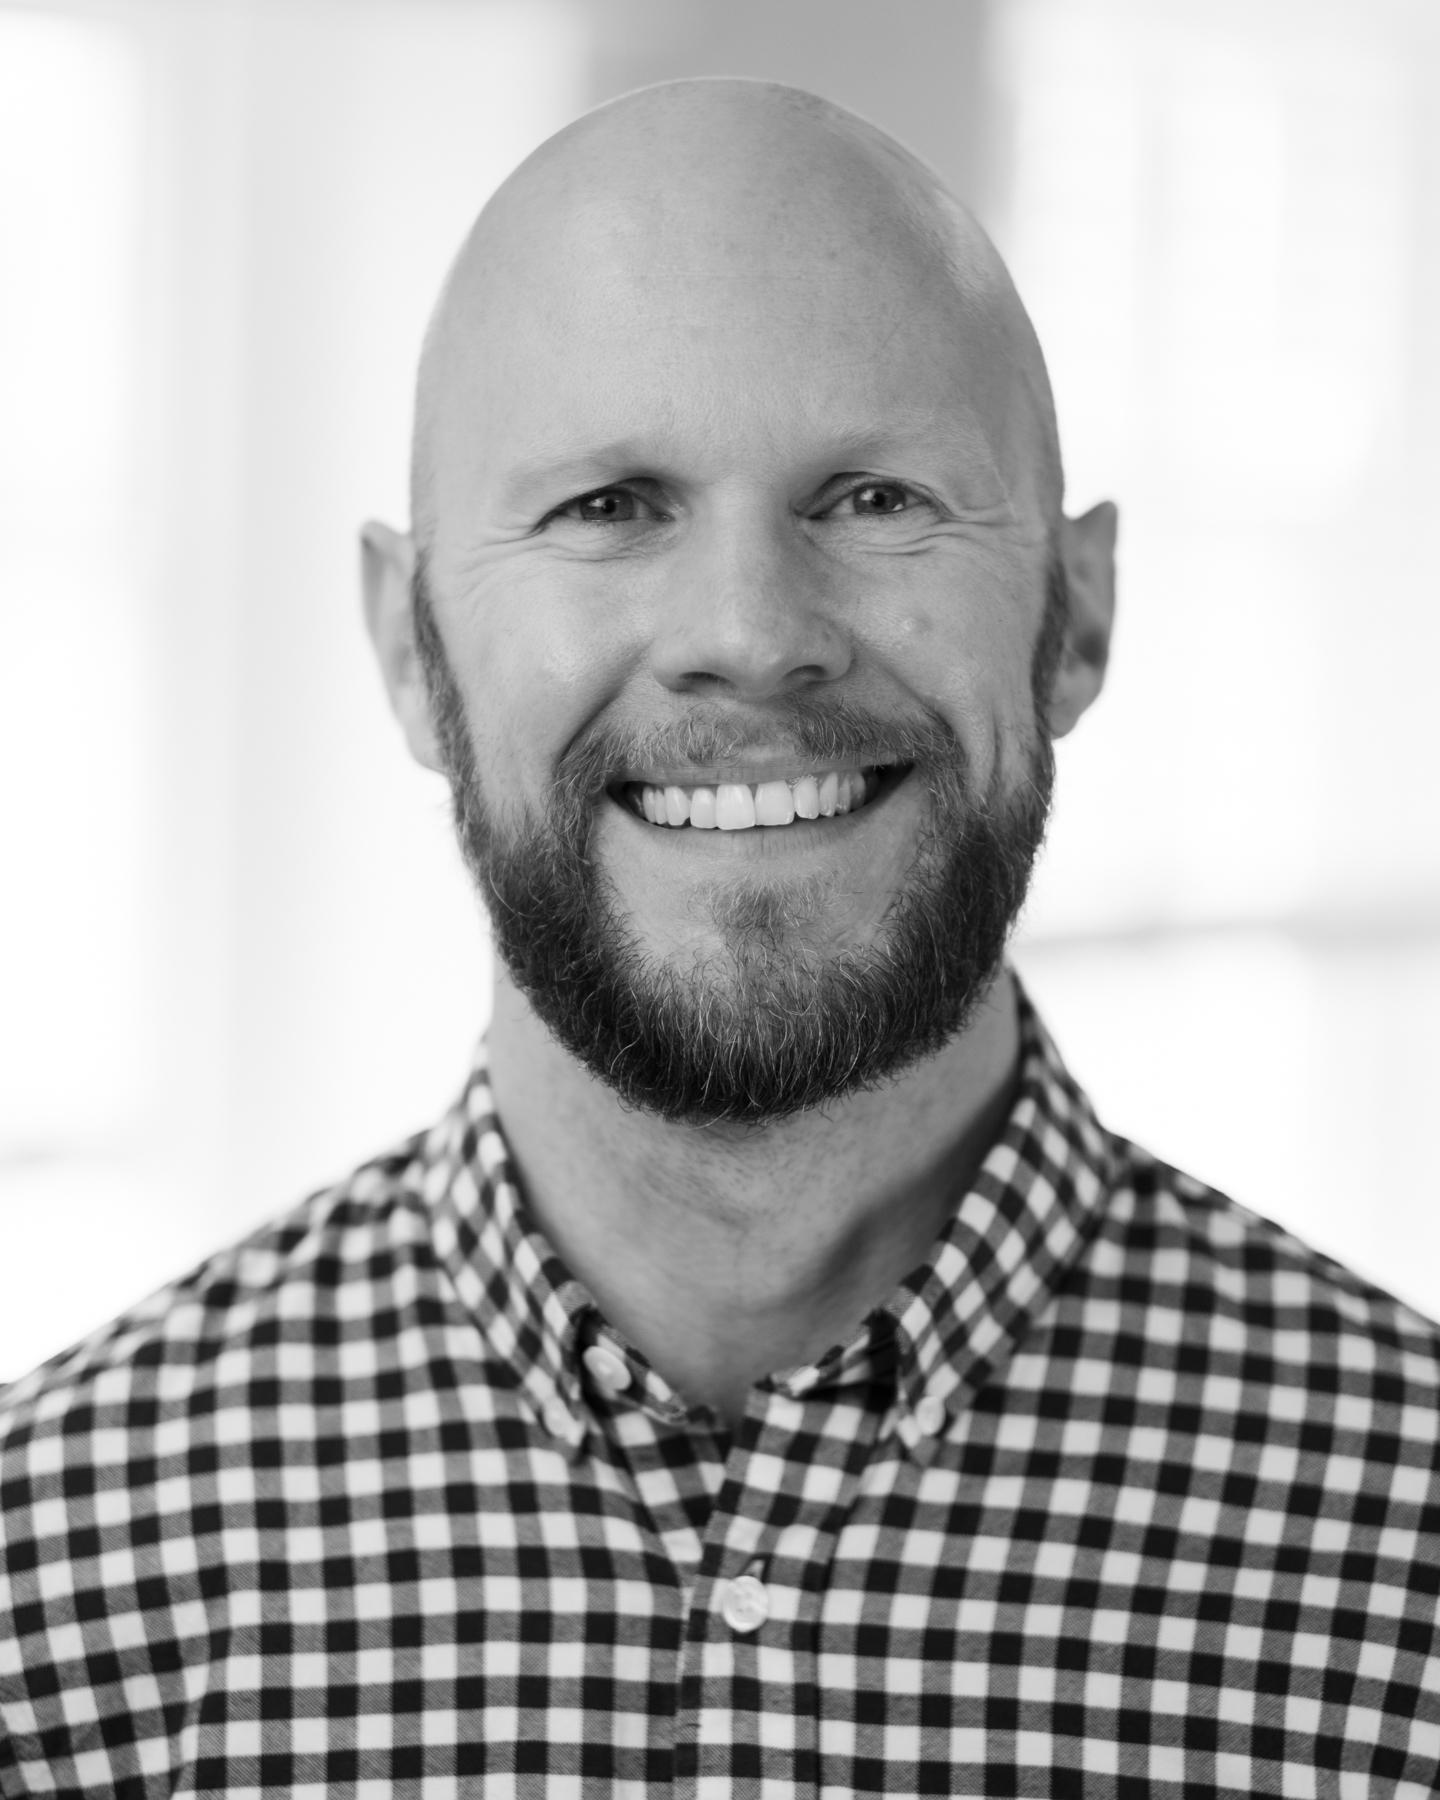 Chris Thatcher, Entrepreneurial Business Consultant at Shift Momentum